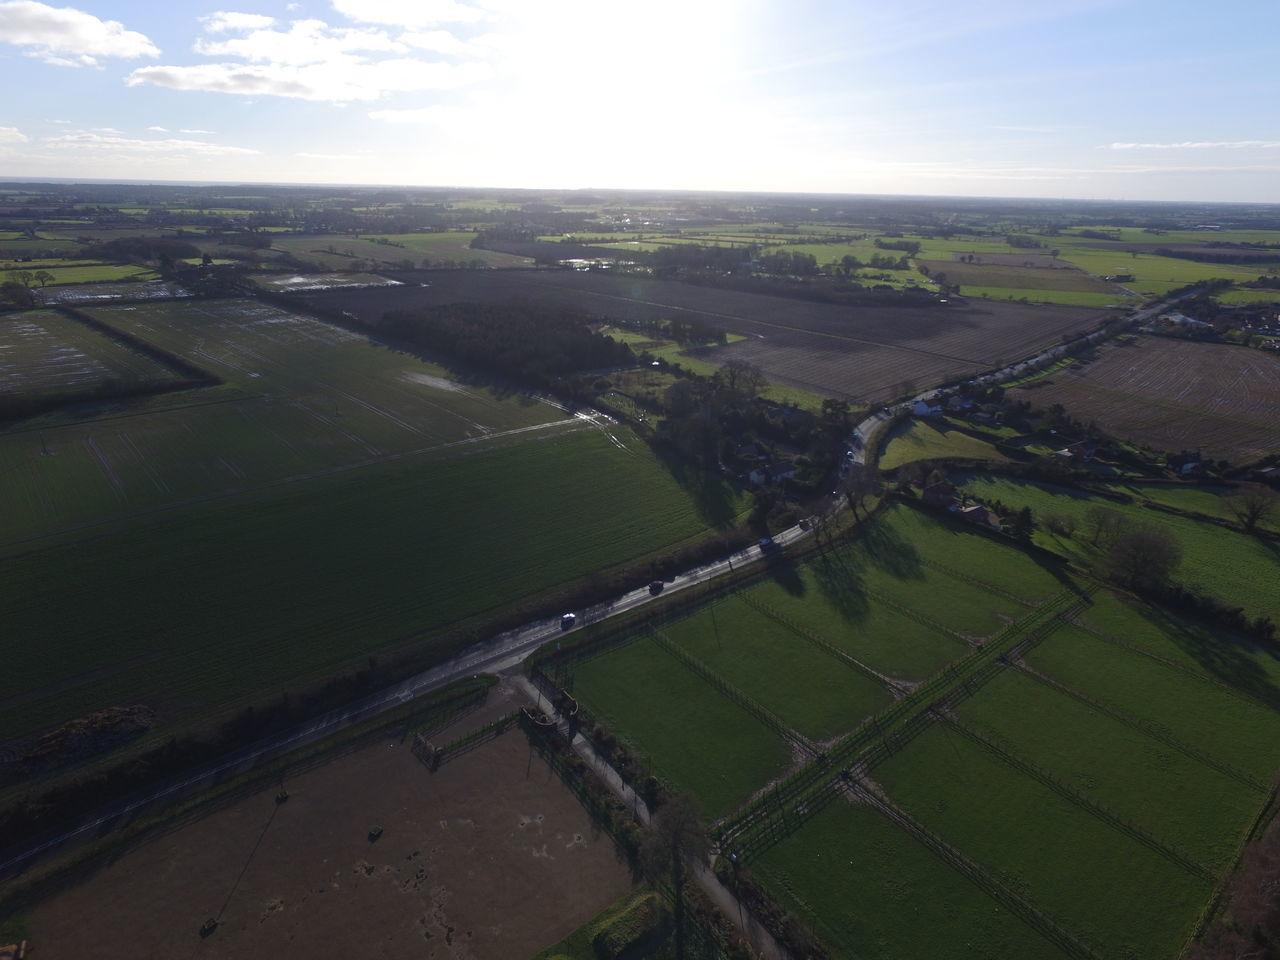 Aerial Photography Aerial View Barnby Barnby Lowestoft Countryside DJI Phantom 3 Pro Drone  Lake Views